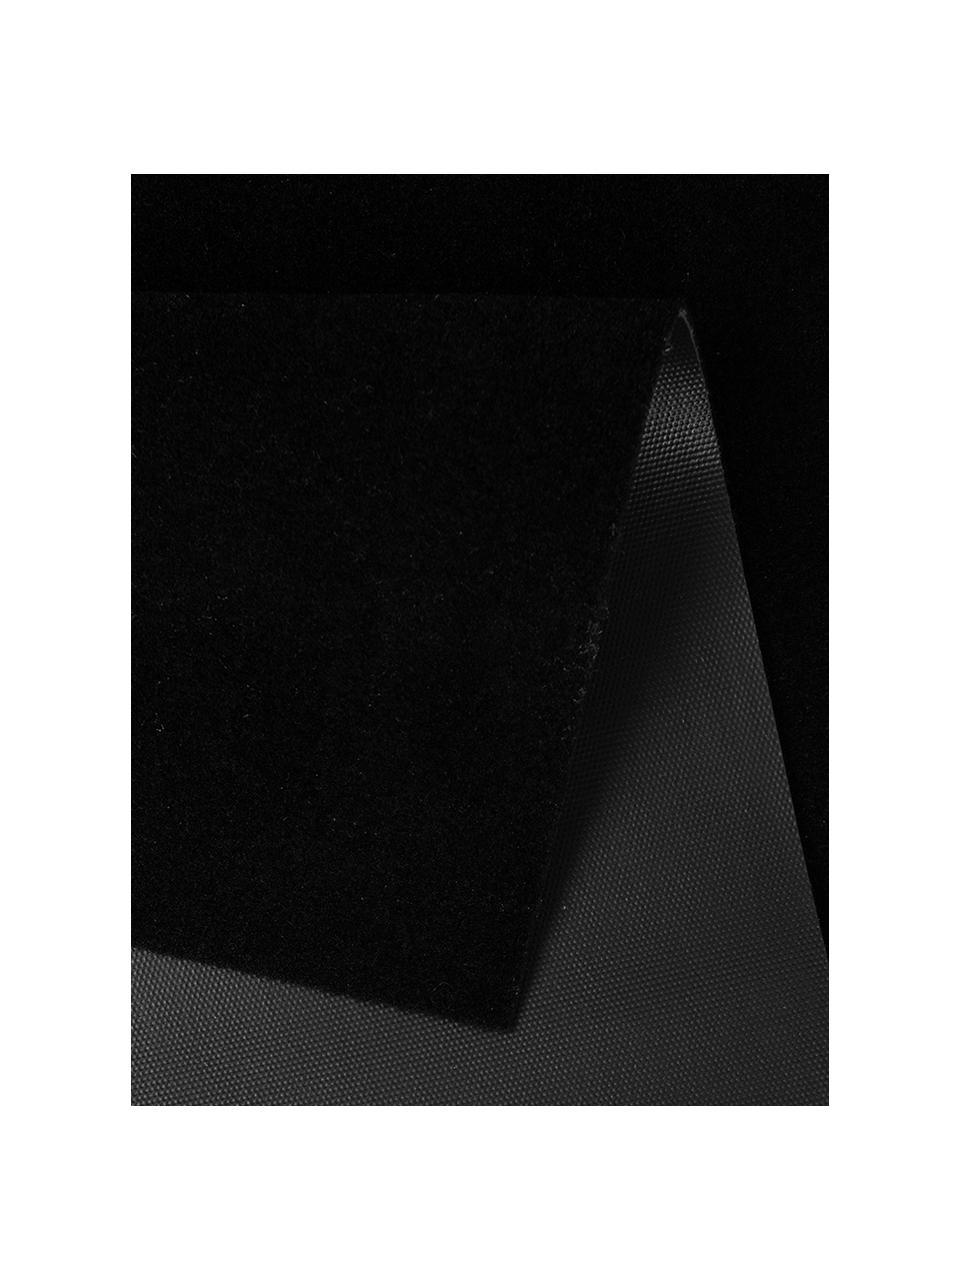 Passatoia da cucina lavabile Cooking with Love, Nero, bianco, Larg. 50 x Lung. 150 cm